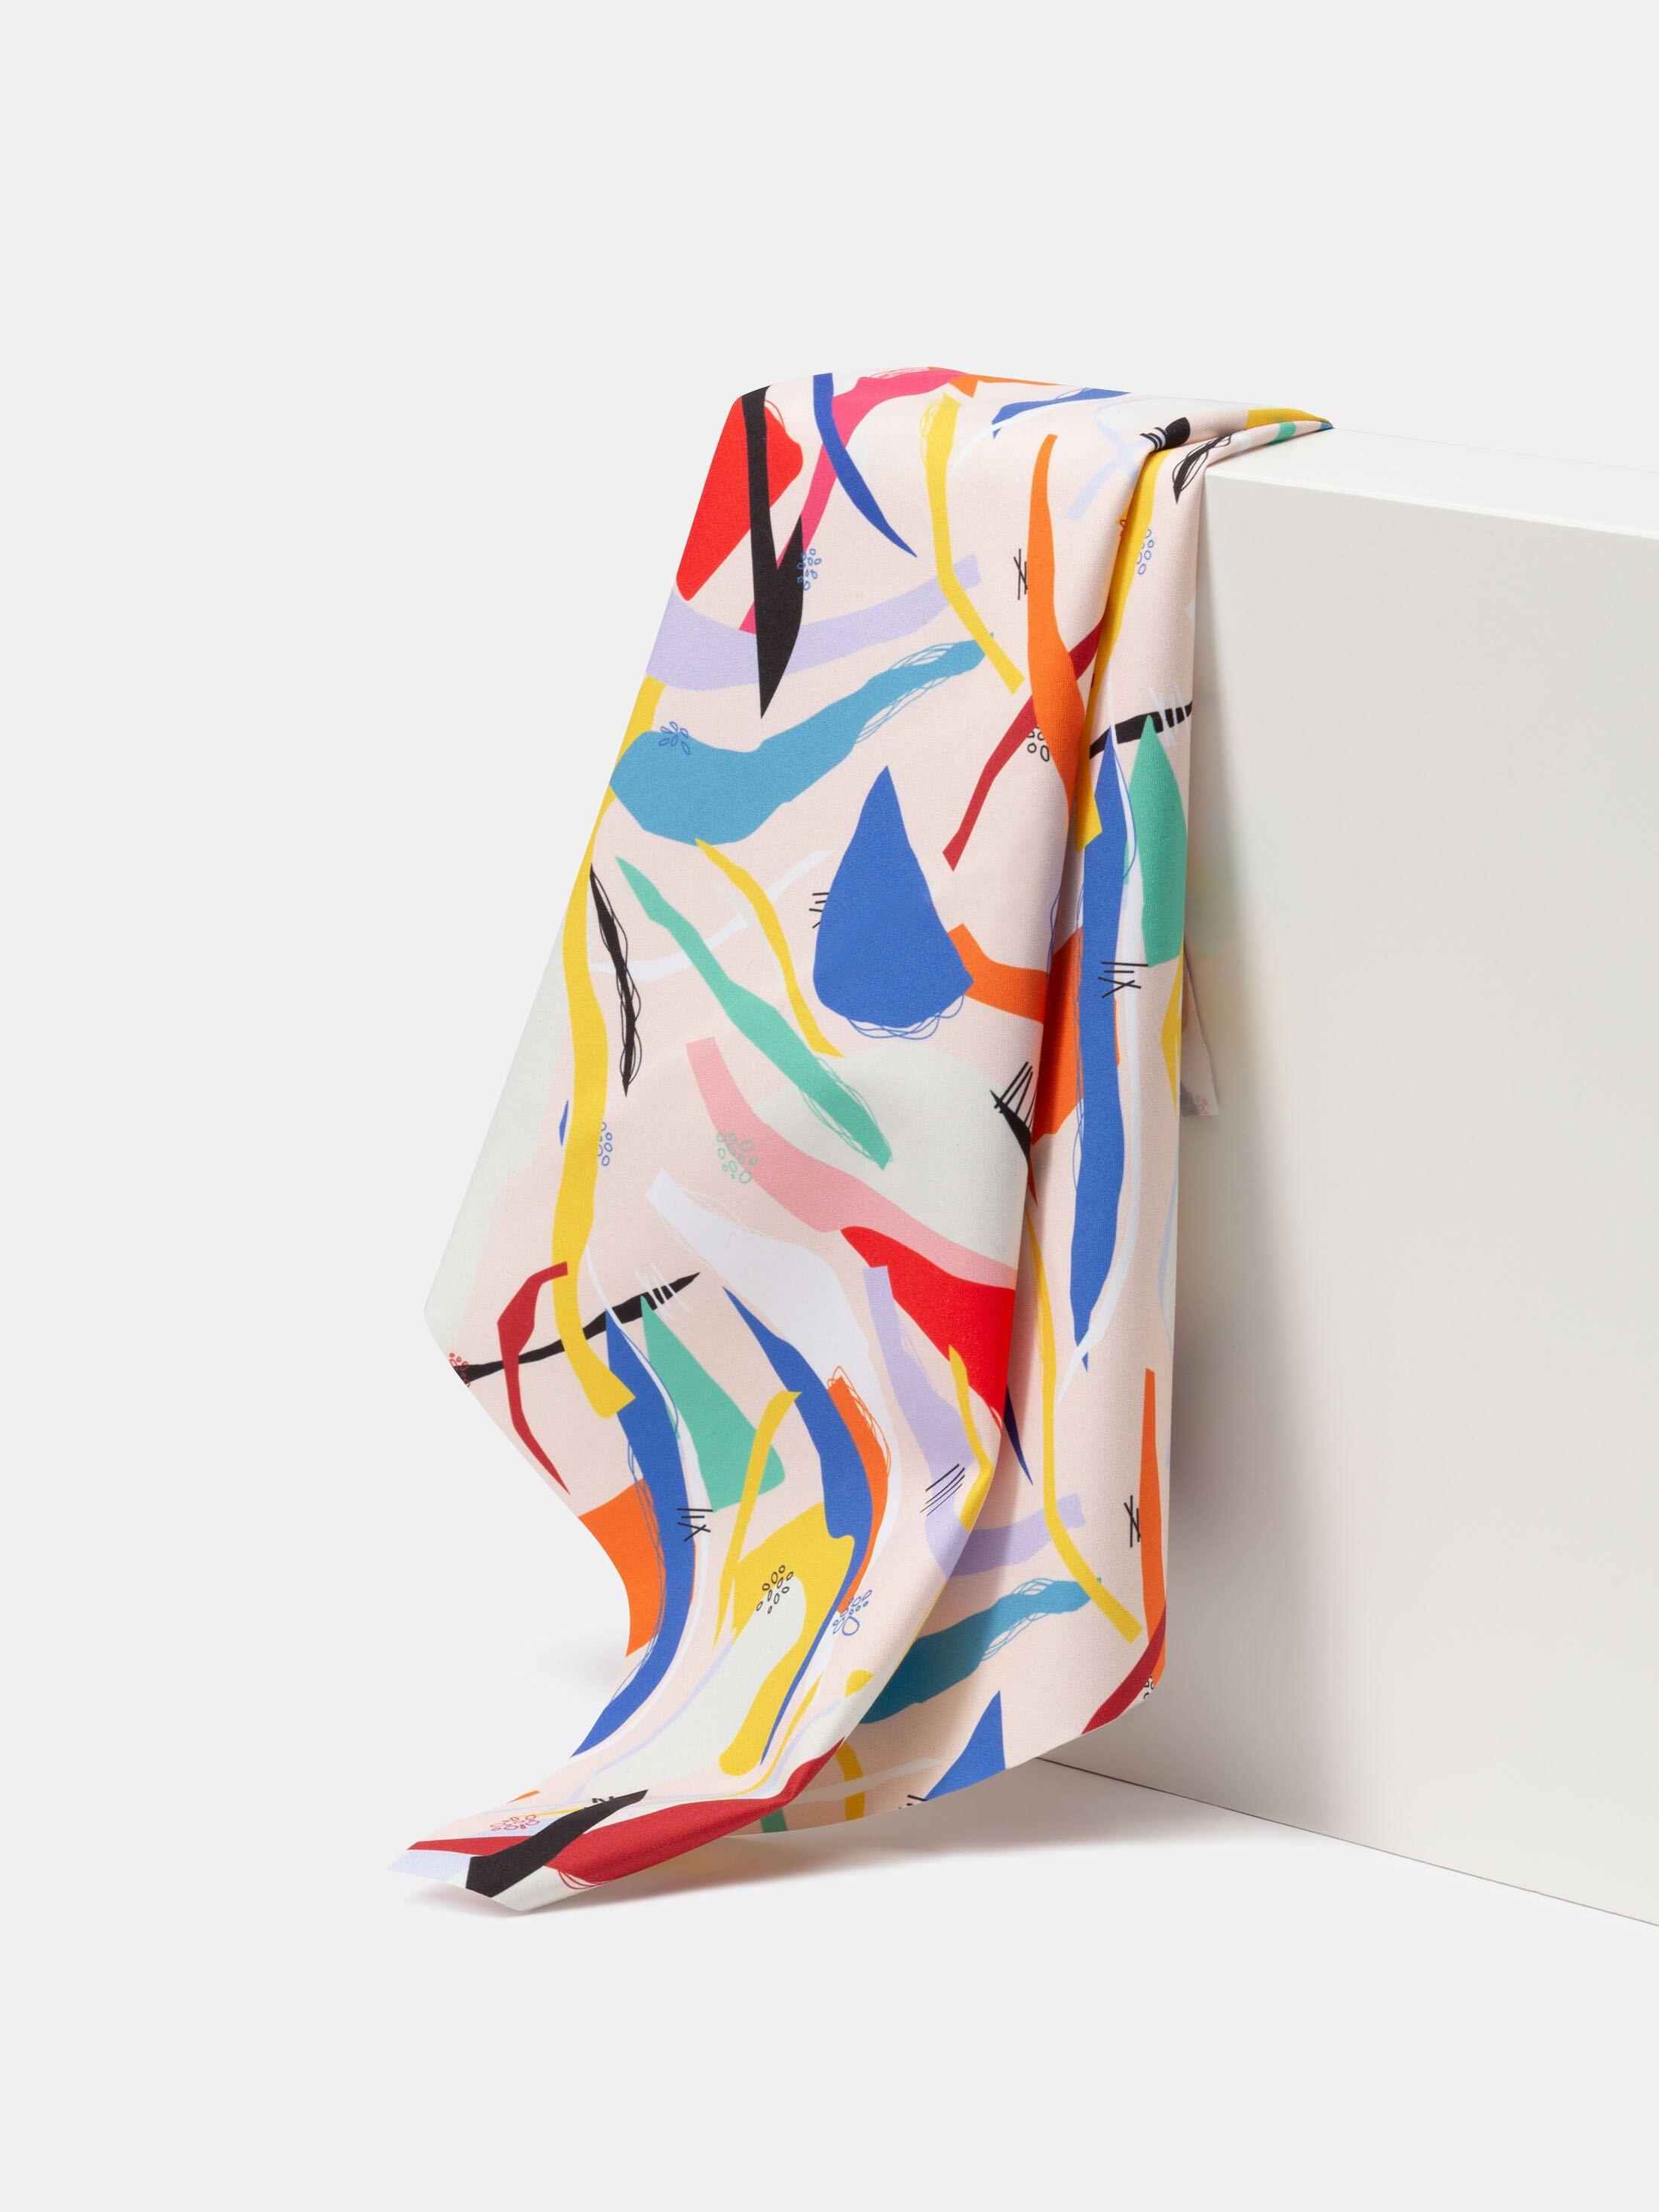 Vattentät textil med eget tryck fåll